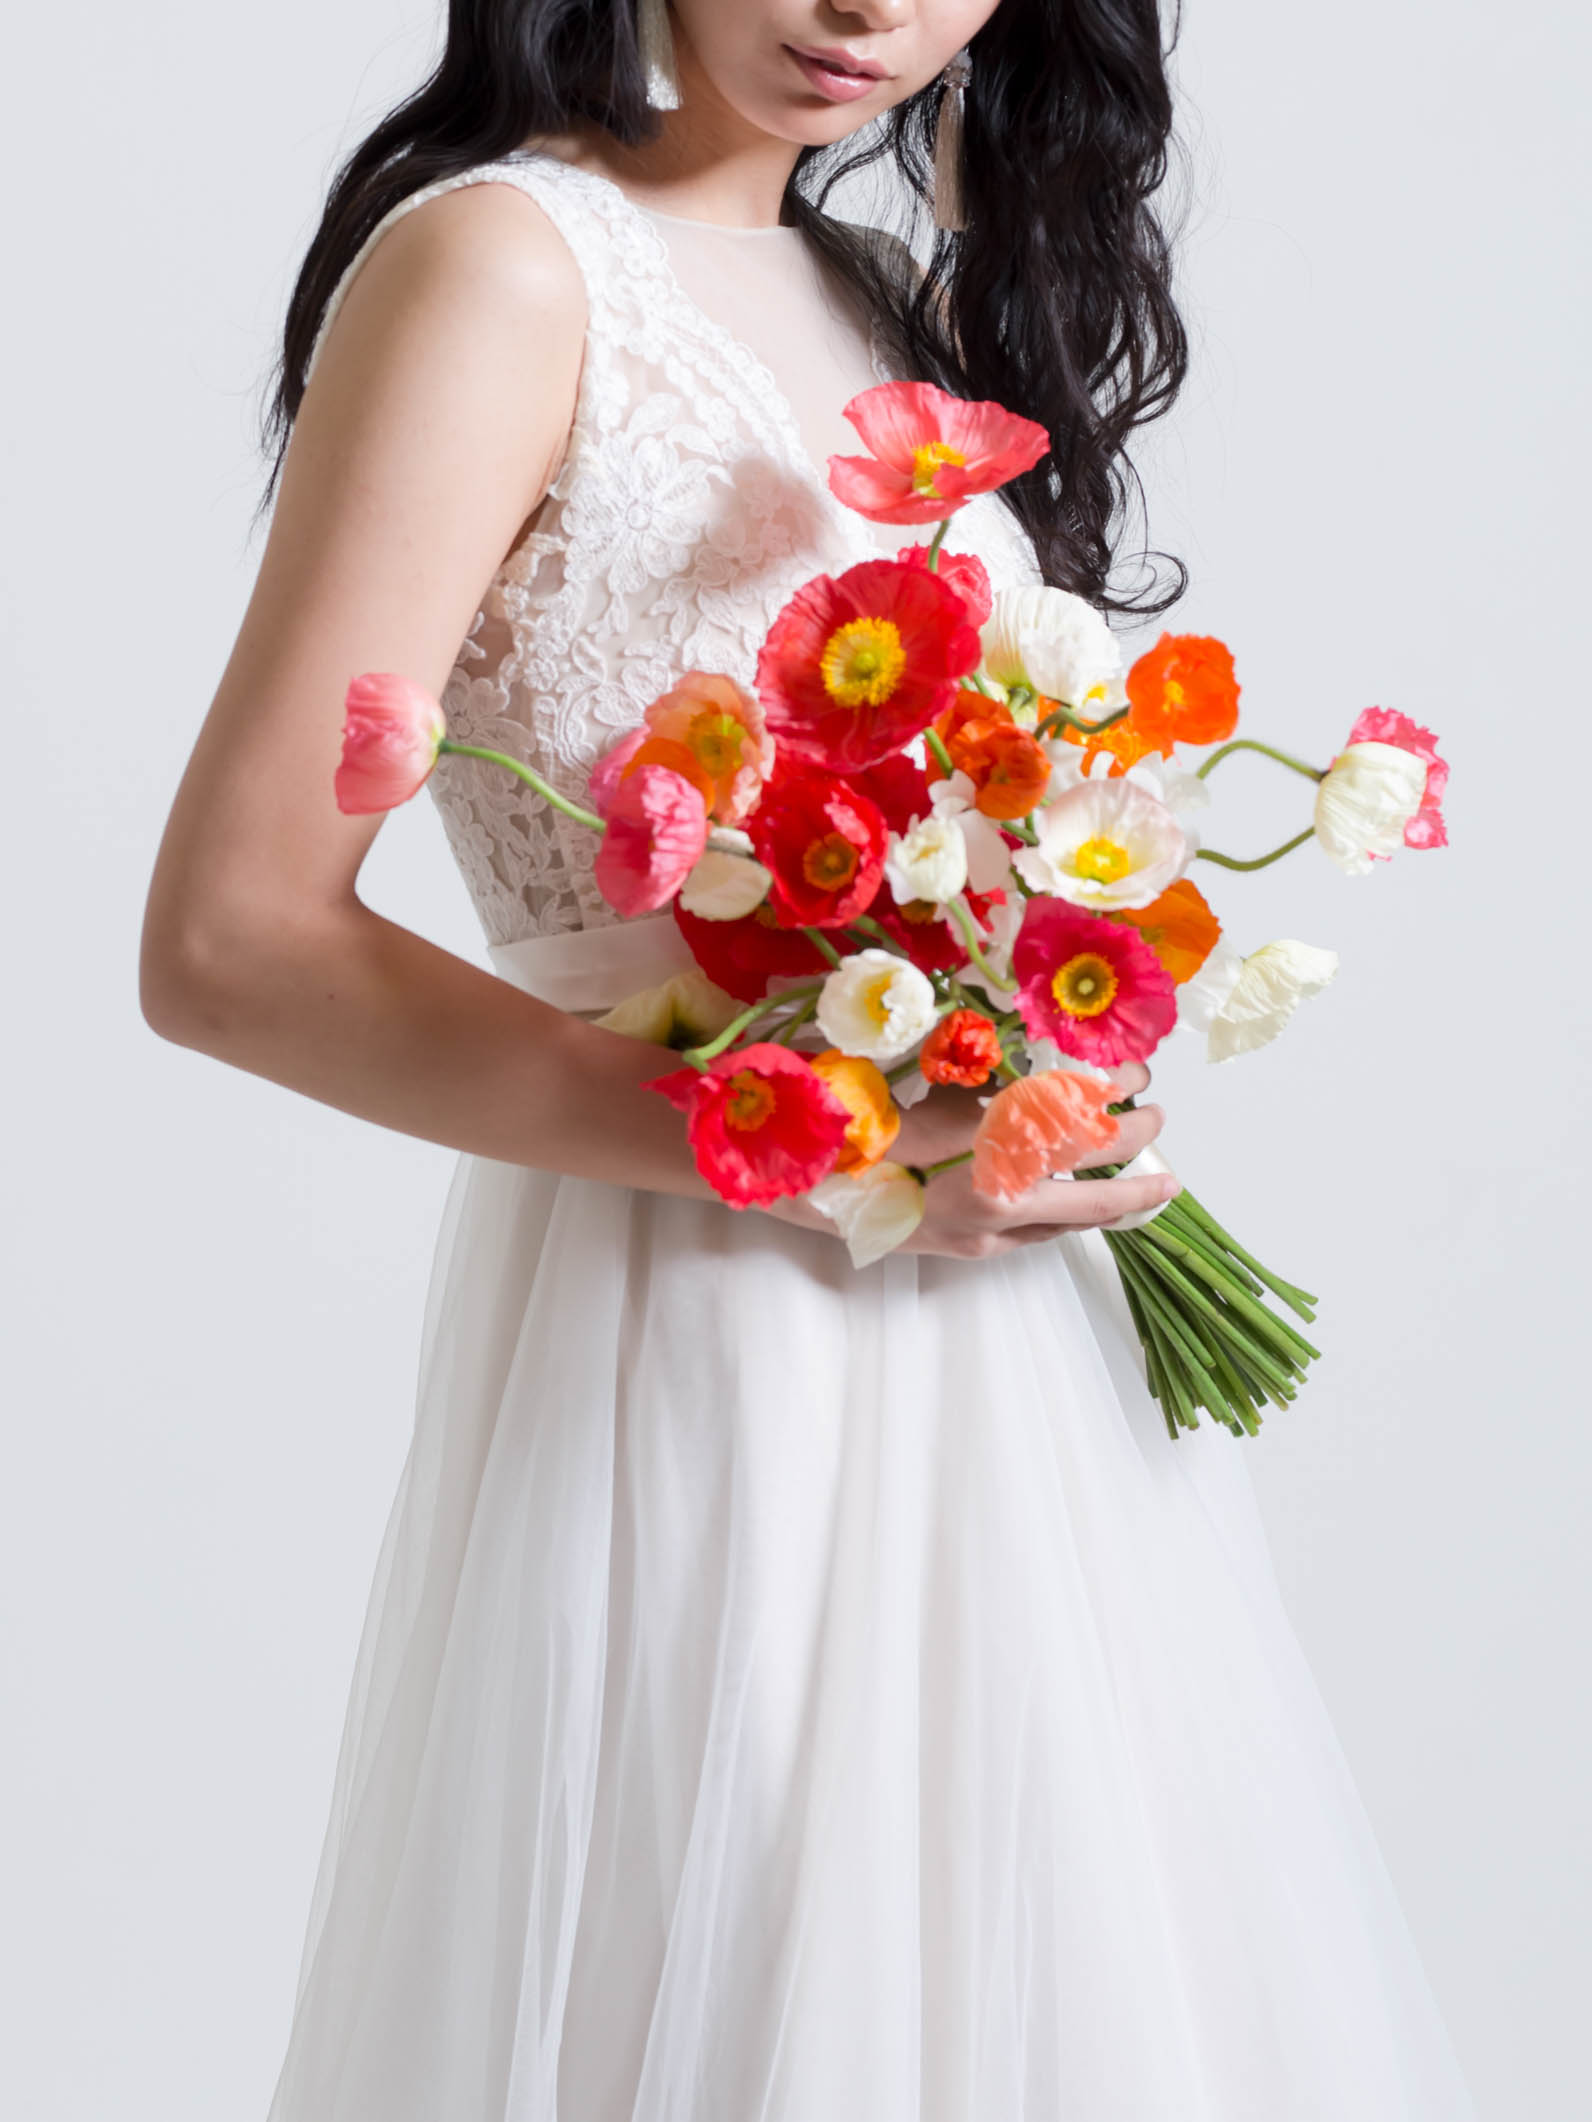 Bridal bouquet ポピーのウェディングブーケ